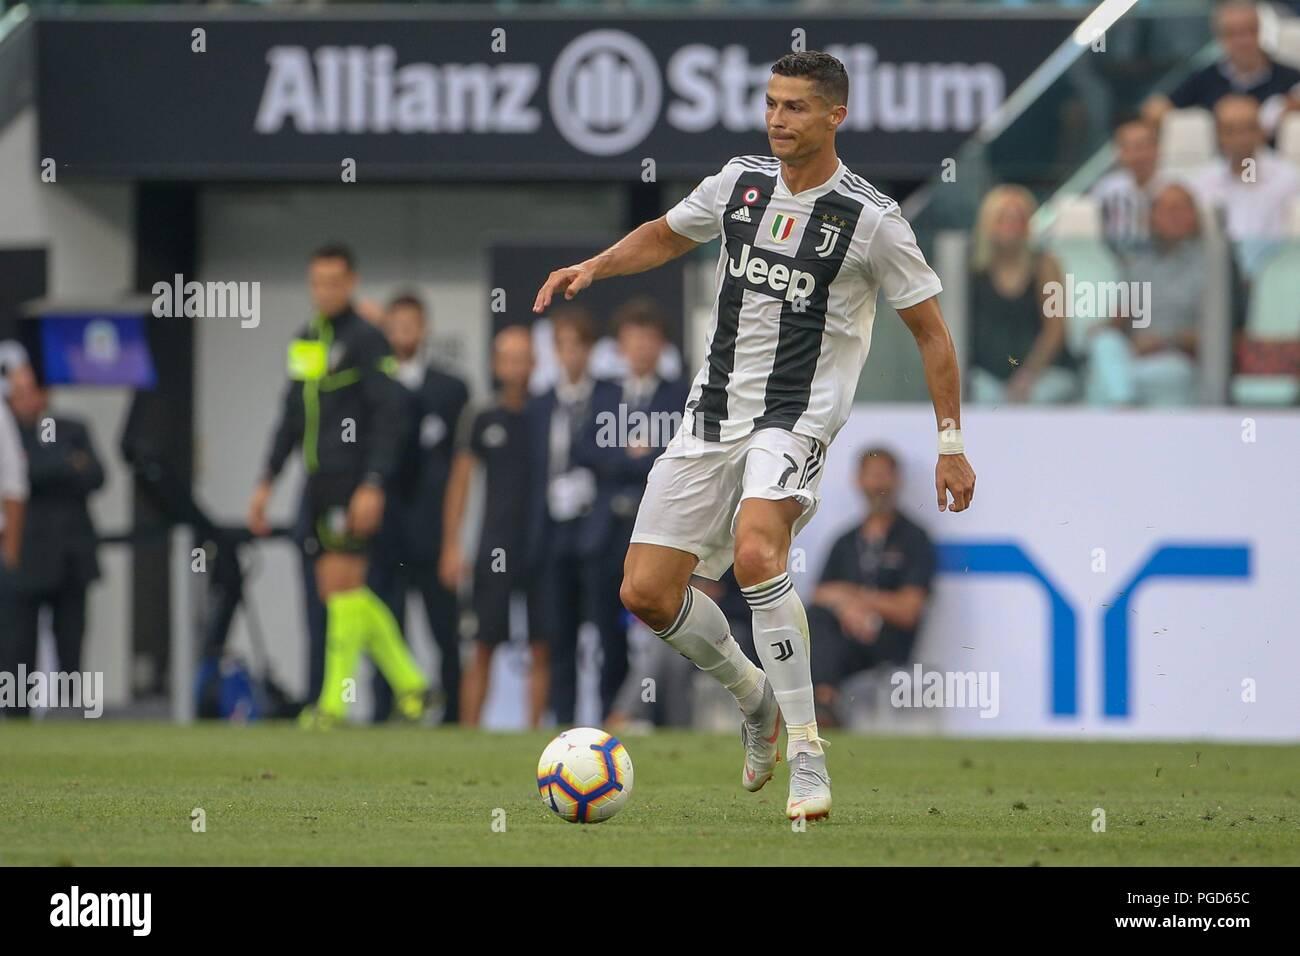 Turin Italien 25th Aug 2018 Firo 25 08 2018 Football